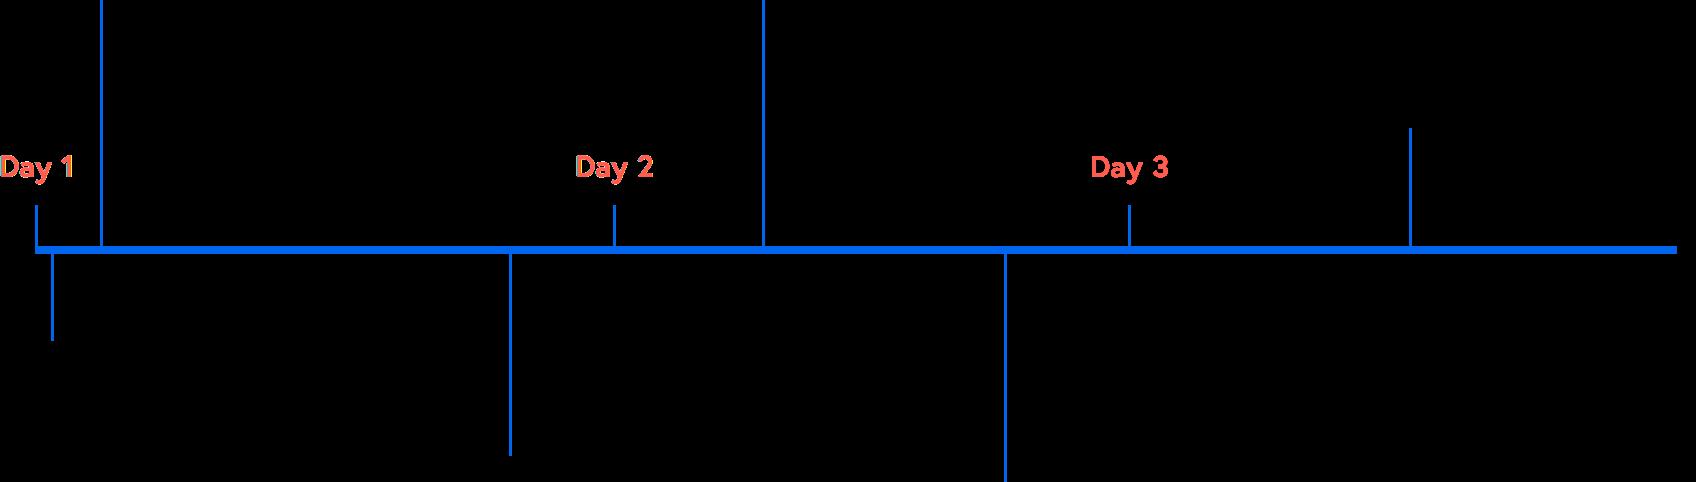 flyhomes plan